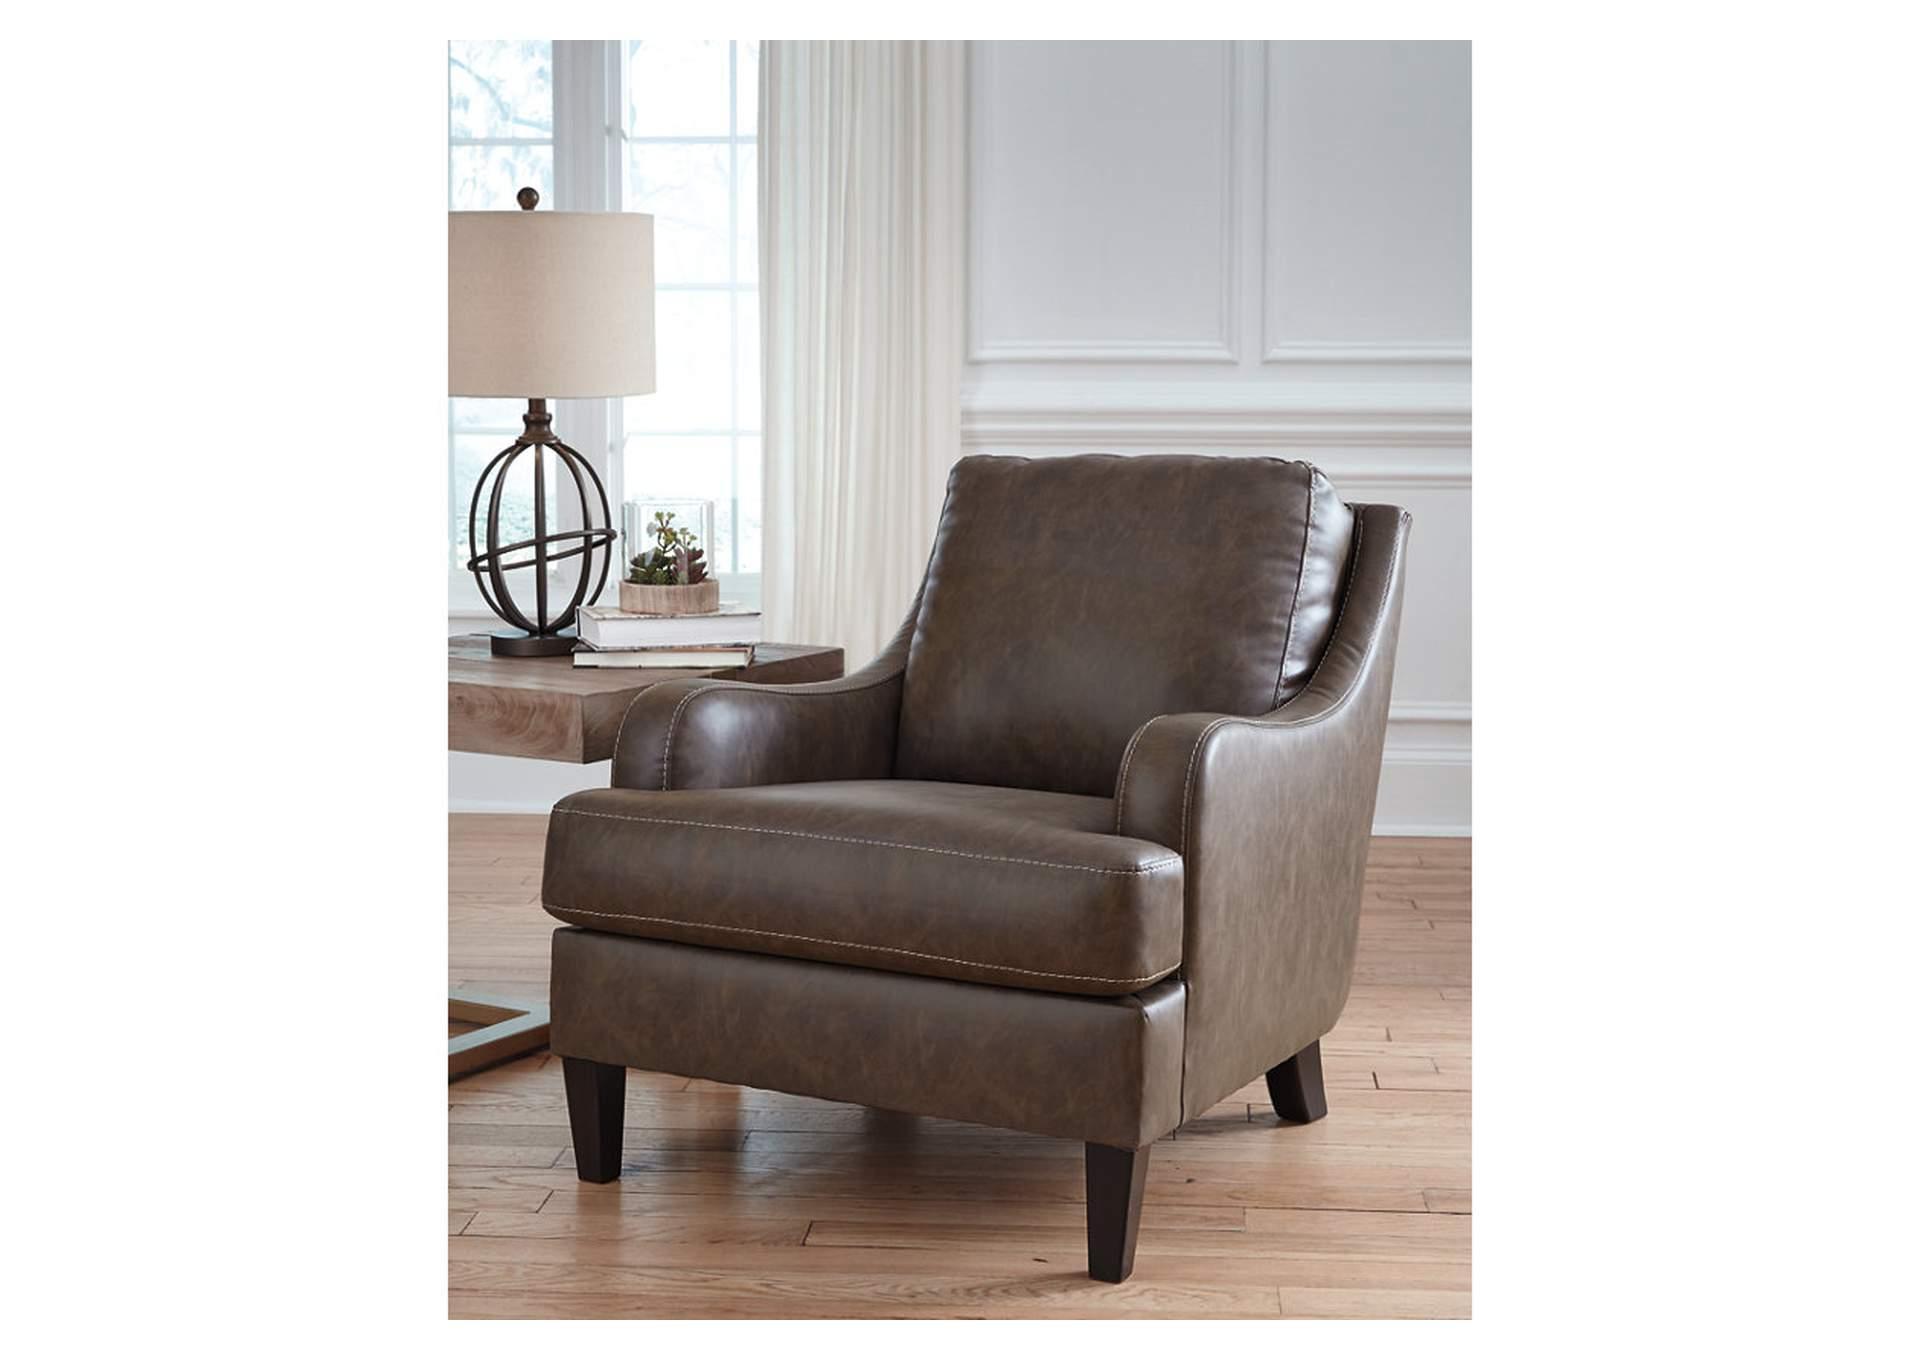 Superb Max Five Star Furniture Tirolo Walnut Accent Chair Creativecarmelina Interior Chair Design Creativecarmelinacom